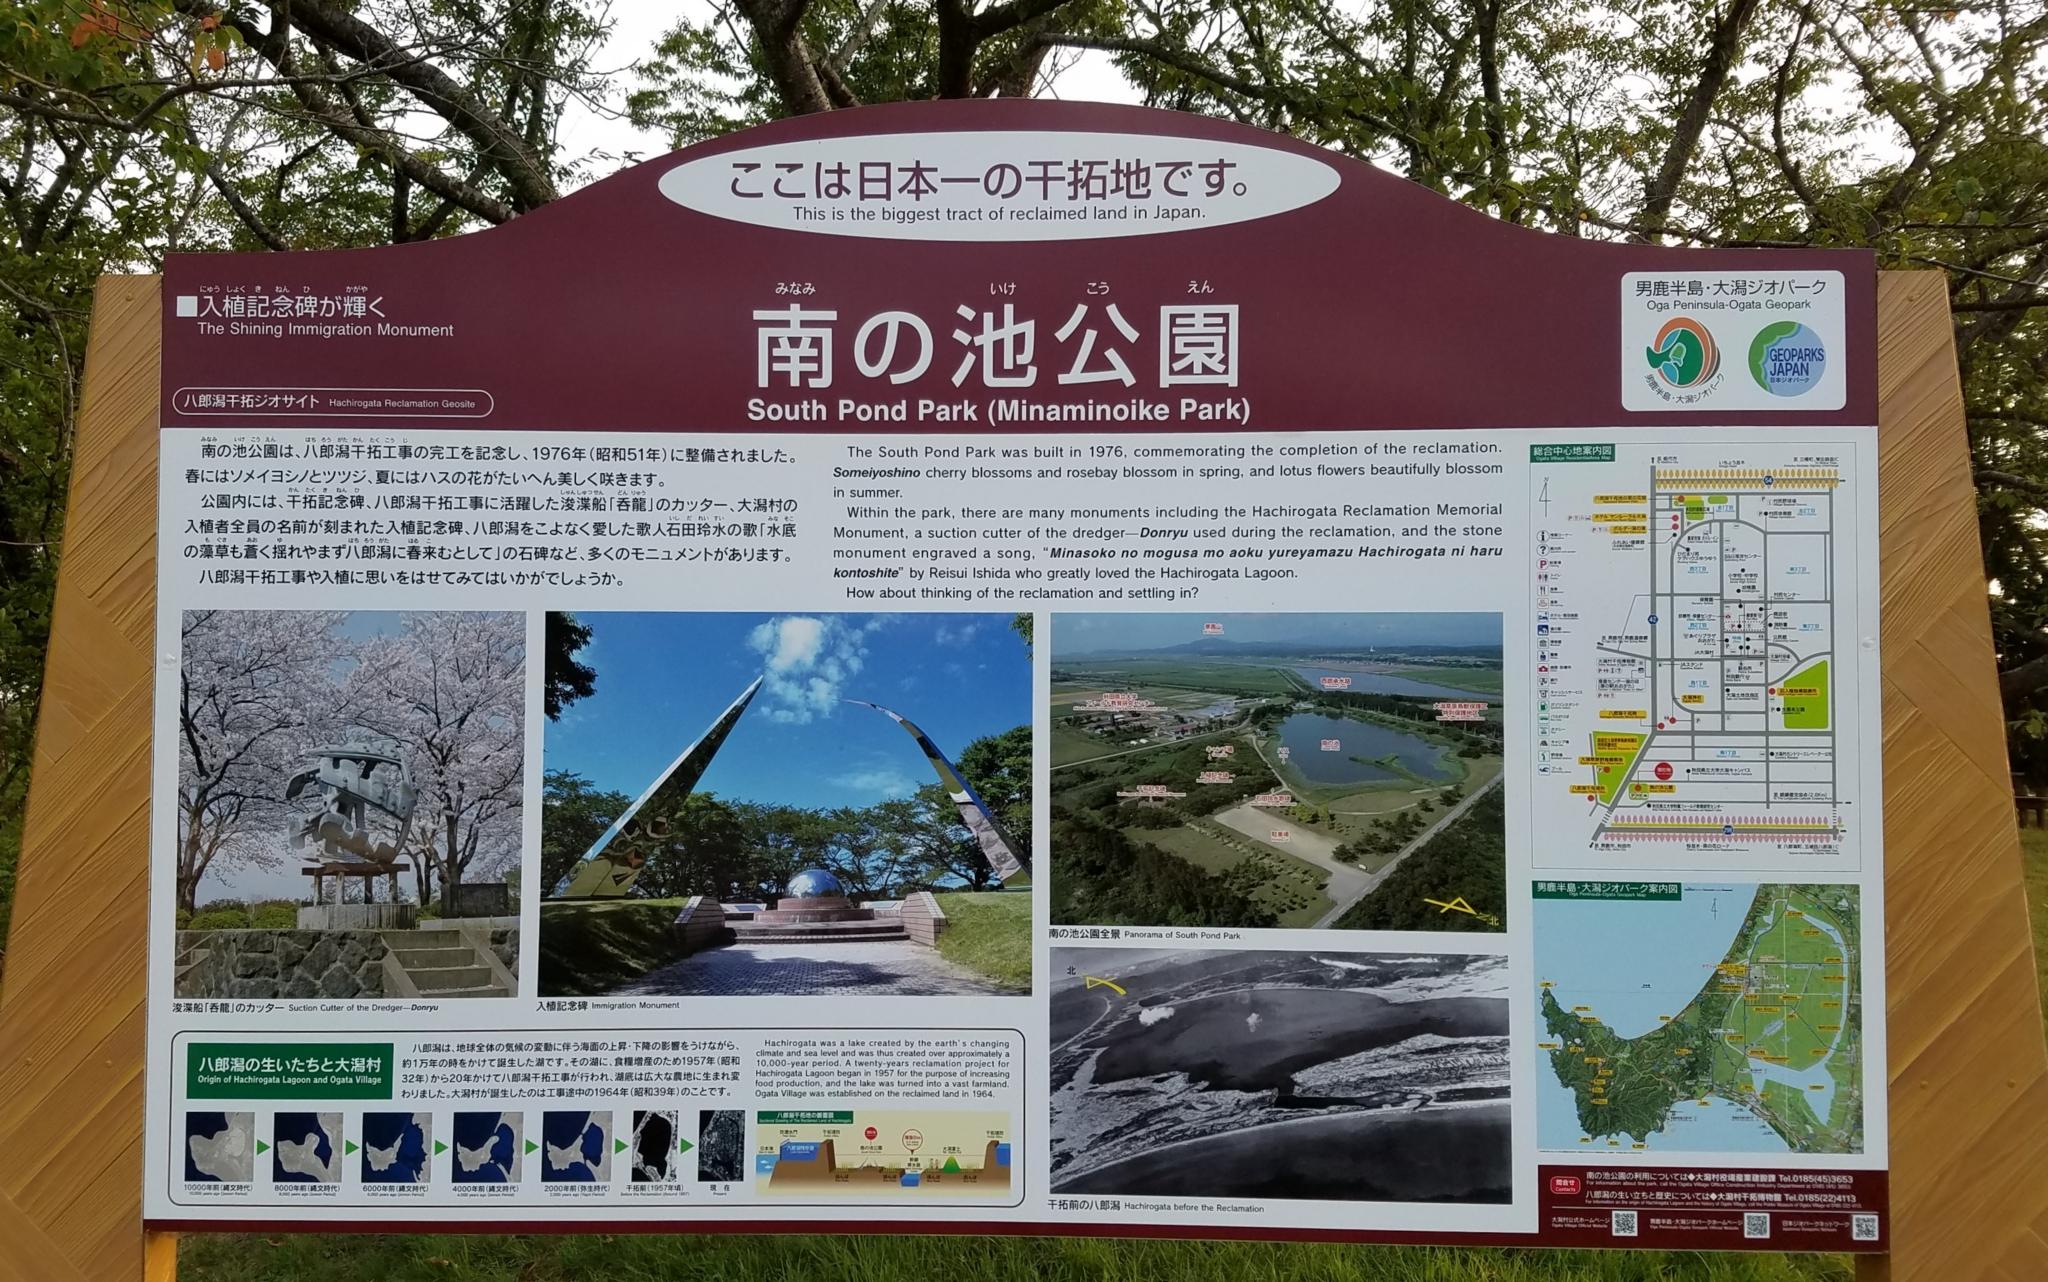 f:id:ToshUeno:20160903174124j:plain